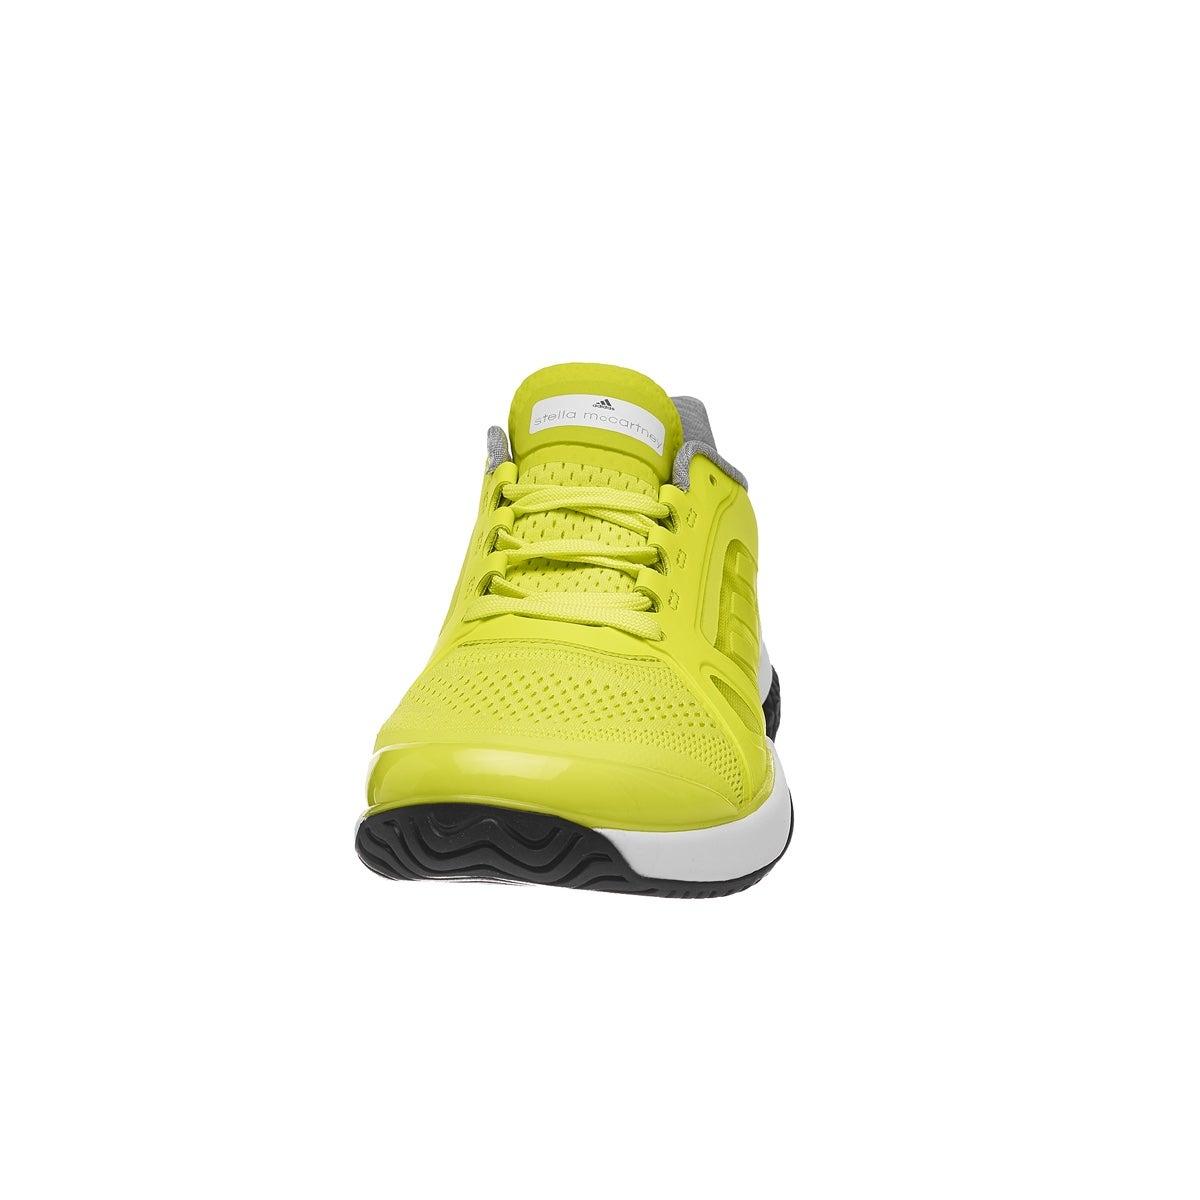 adidas aSMC Barricade Boost LimeWhite Women's Shoes 360° View